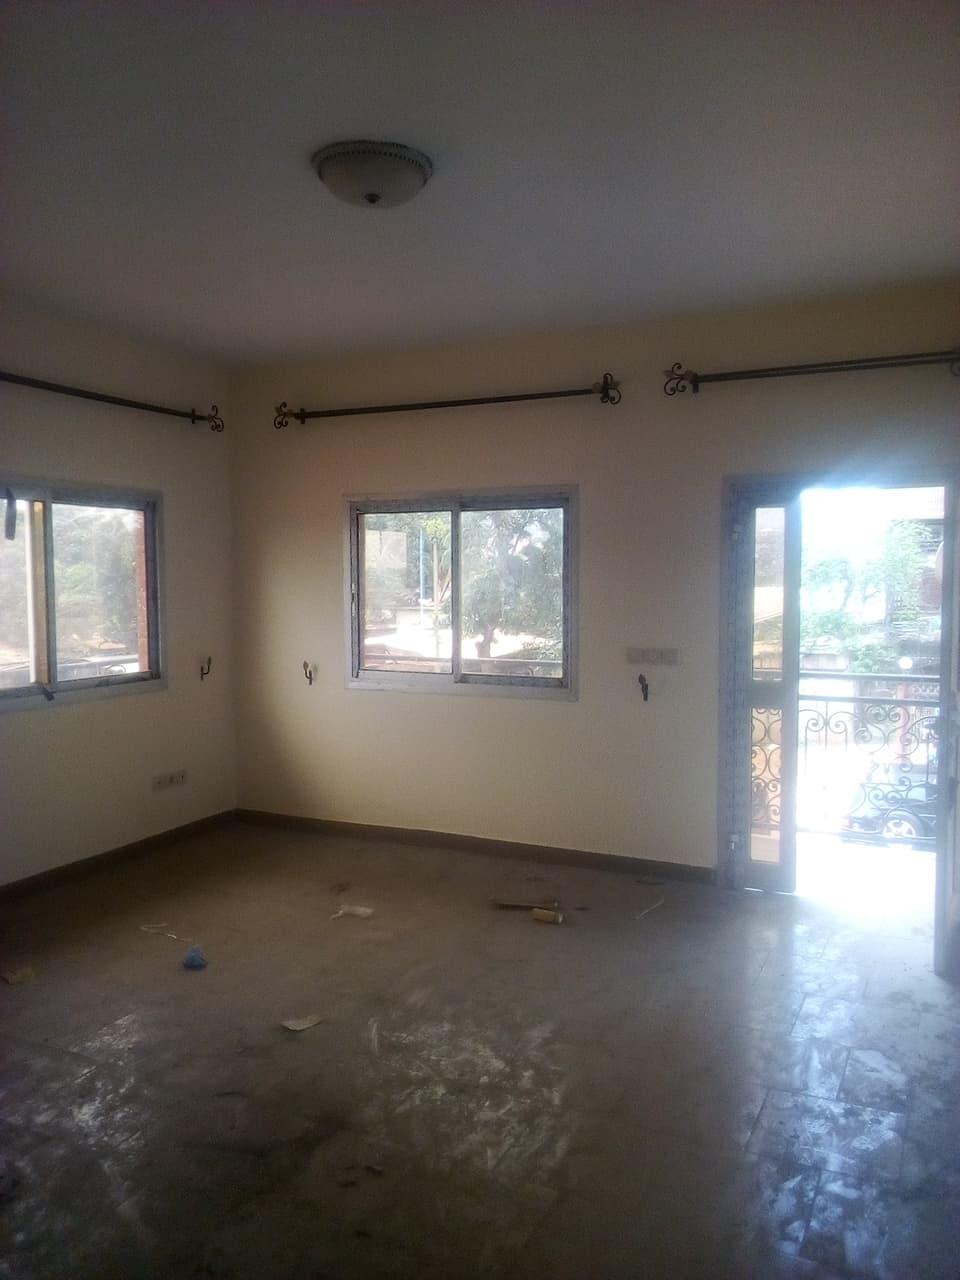 Apartment to rent - Yaoundé, Tsinga, pas loin de fecafoot - 1 living room(s), 3 bedroom(s), 4 bathroom(s) - 280 000 FCFA / month